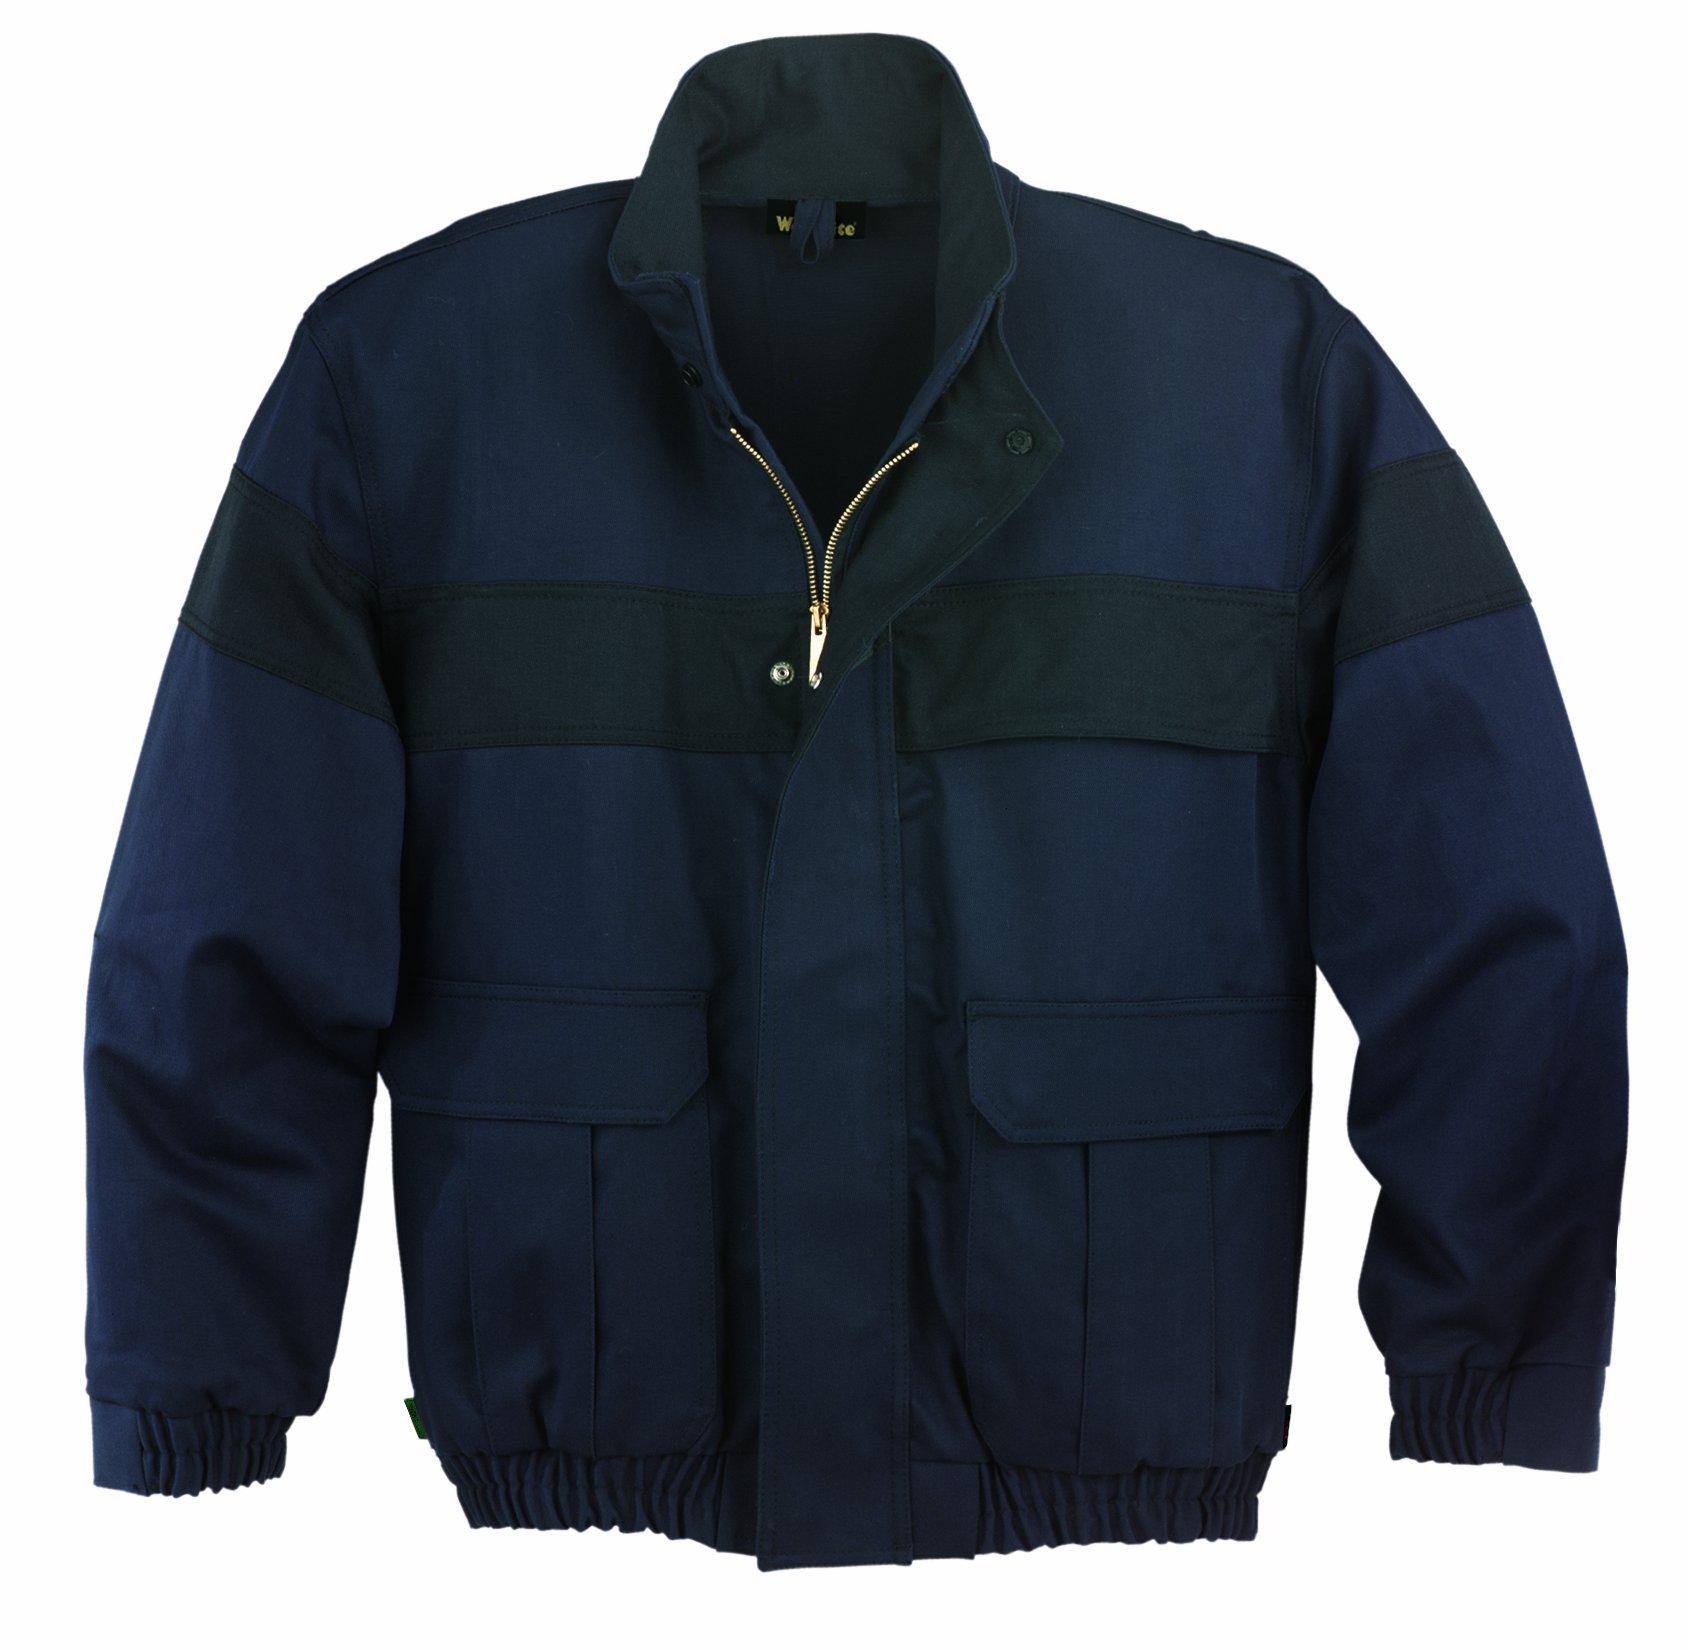 Workrite FR Flame Resistant 9.5 oz UltraSoft Bomber Jacket, Elastic Cuff, Medium, Regular Length, Navy Blue